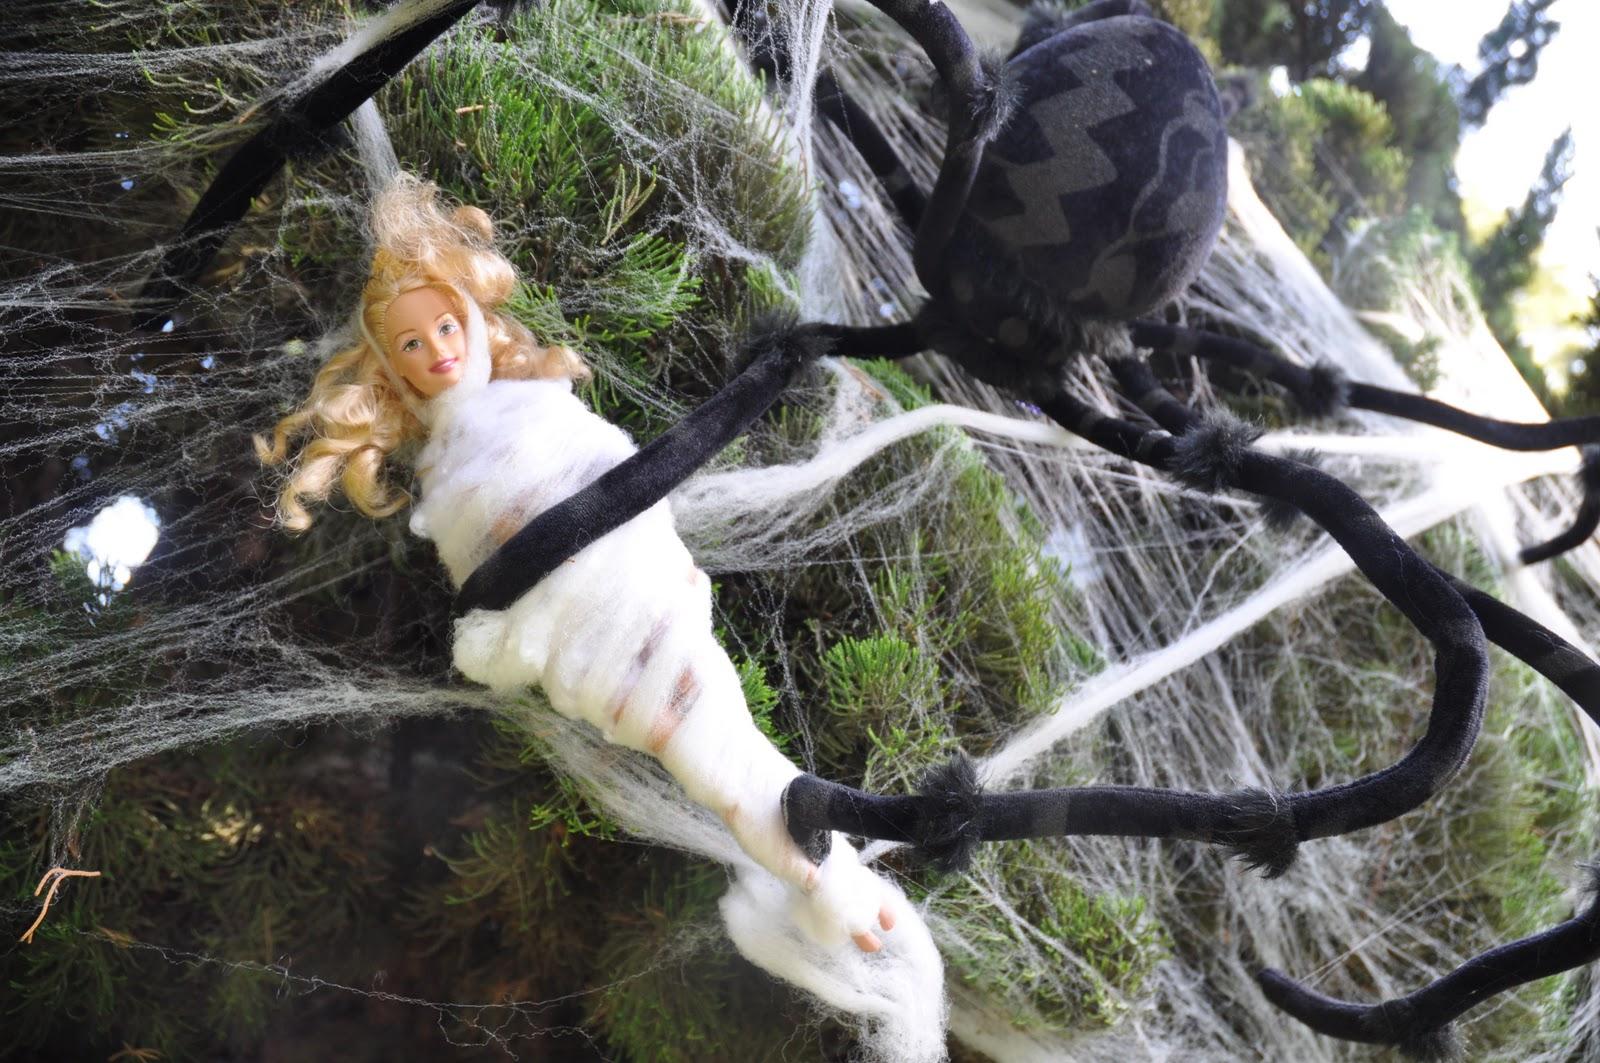 web Bondage spider trapped him